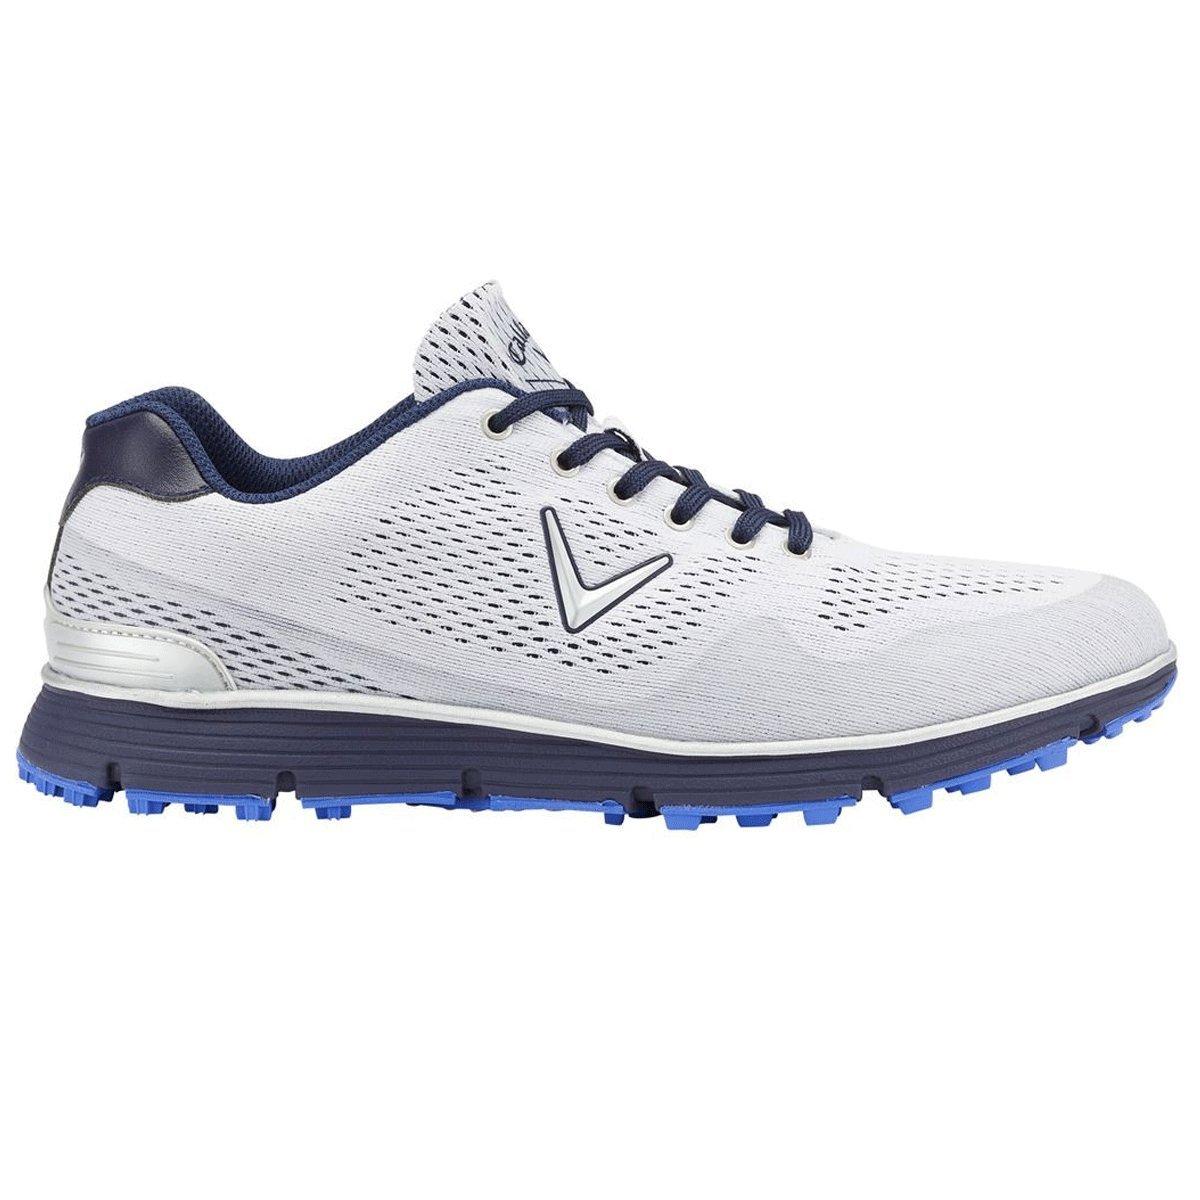 Callaway Golf 2018 Mens Chev Series Vent Spikeless Golf Shoes B078W79LYR 7.5 UK/ EUR 41 / US 8.5 White/Peacoat